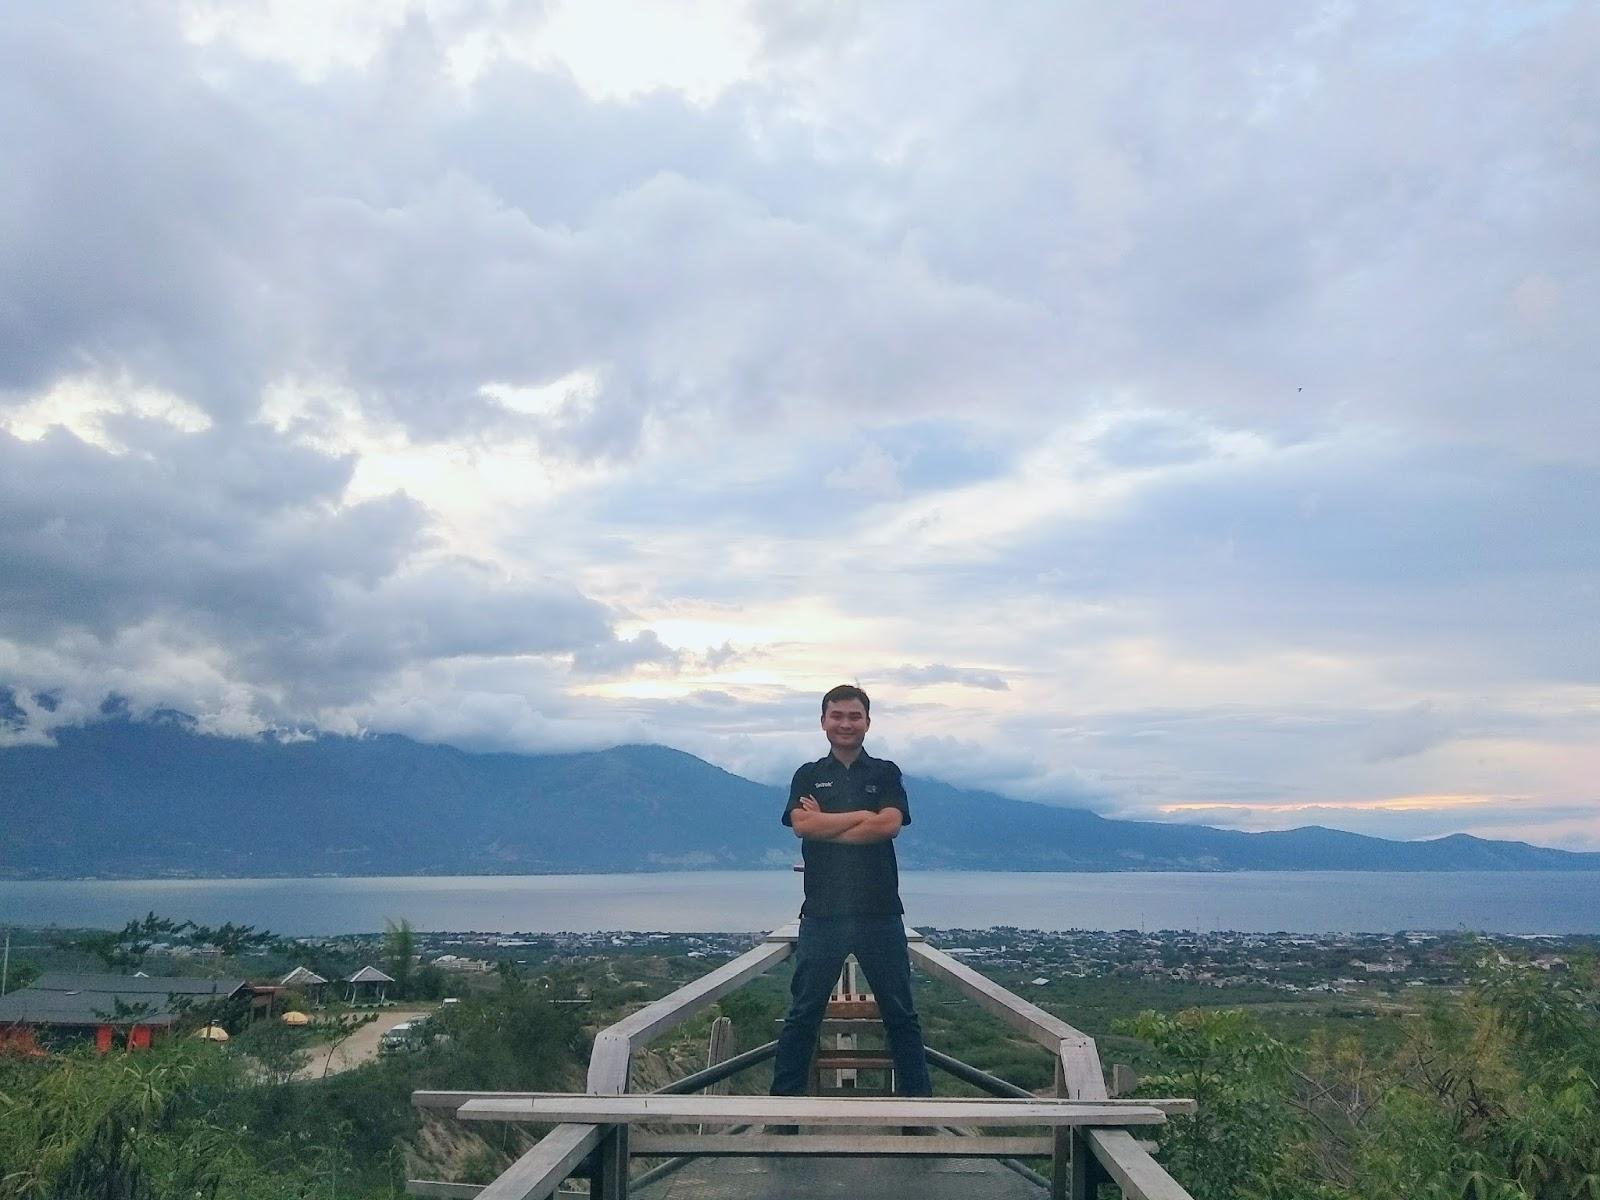 Gong Perdamaian Nusantara Palu Tora Bastem Spot Apik Berfoto Latar